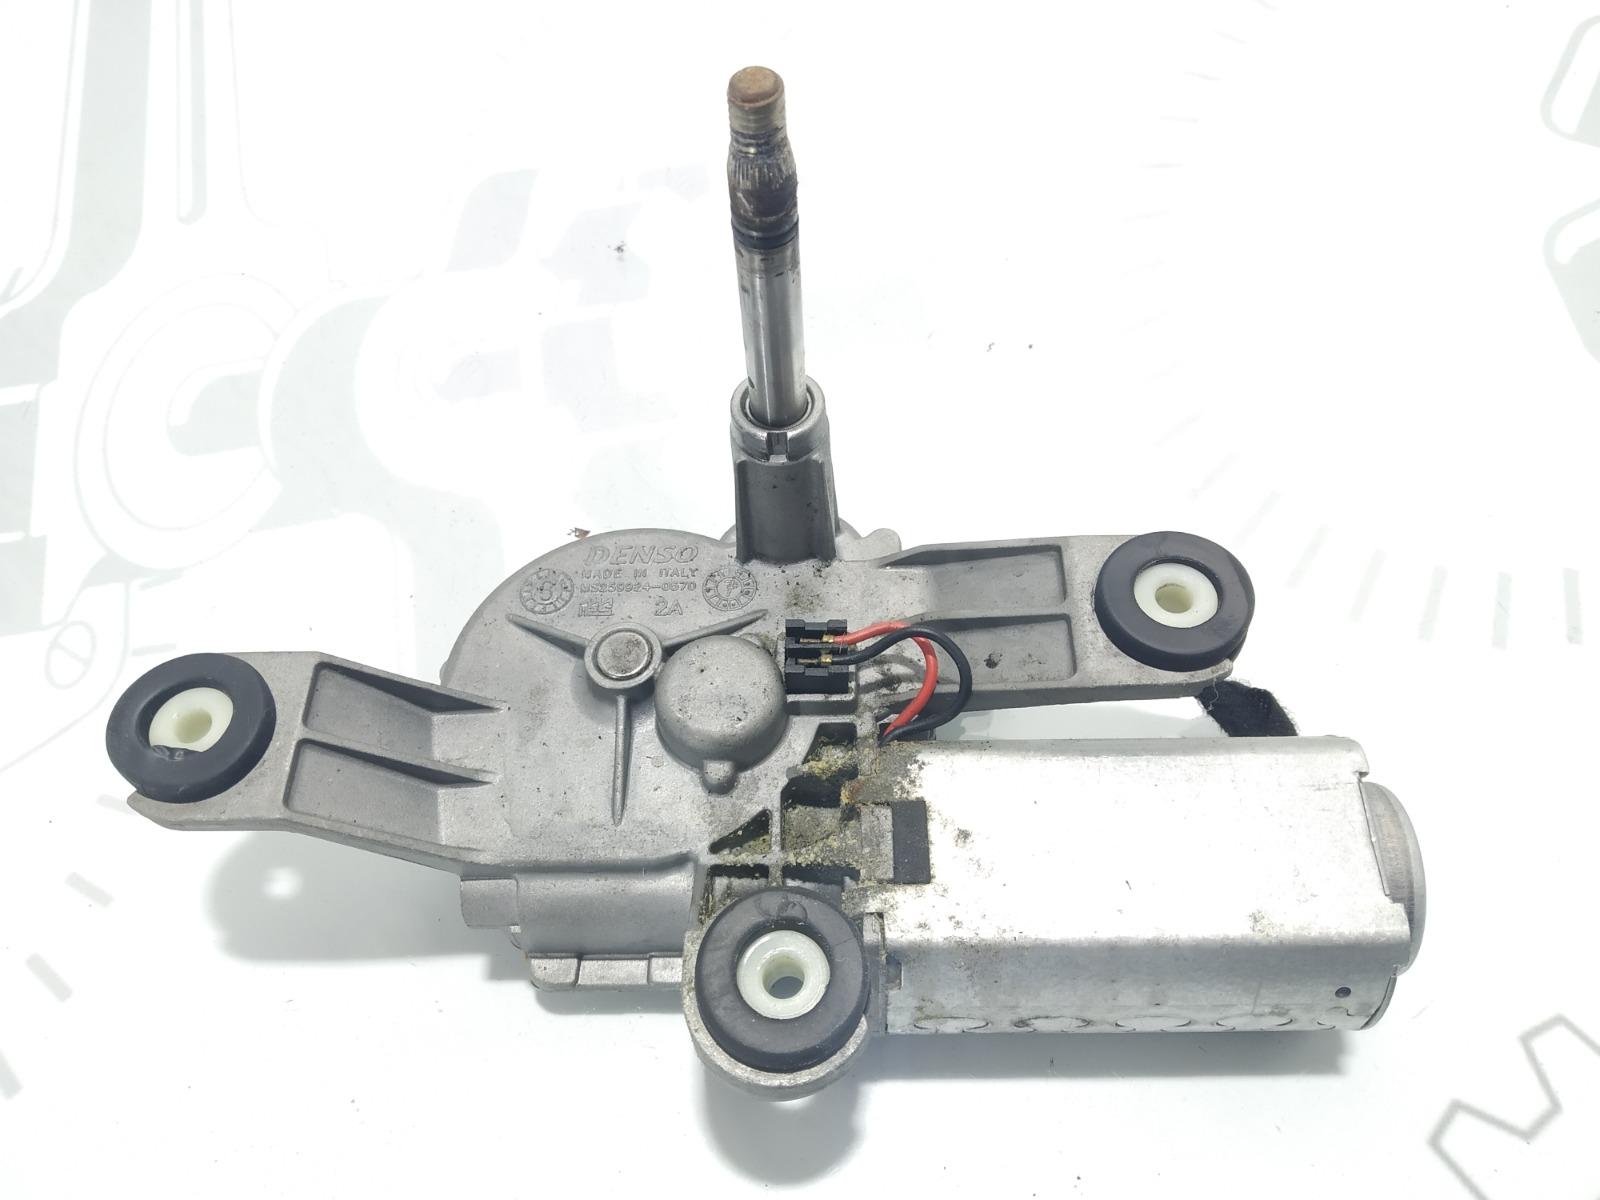 Моторчик заднего стеклоочистителя (дворника) Fiat Bravo 1.4 I 2008 (б/у)